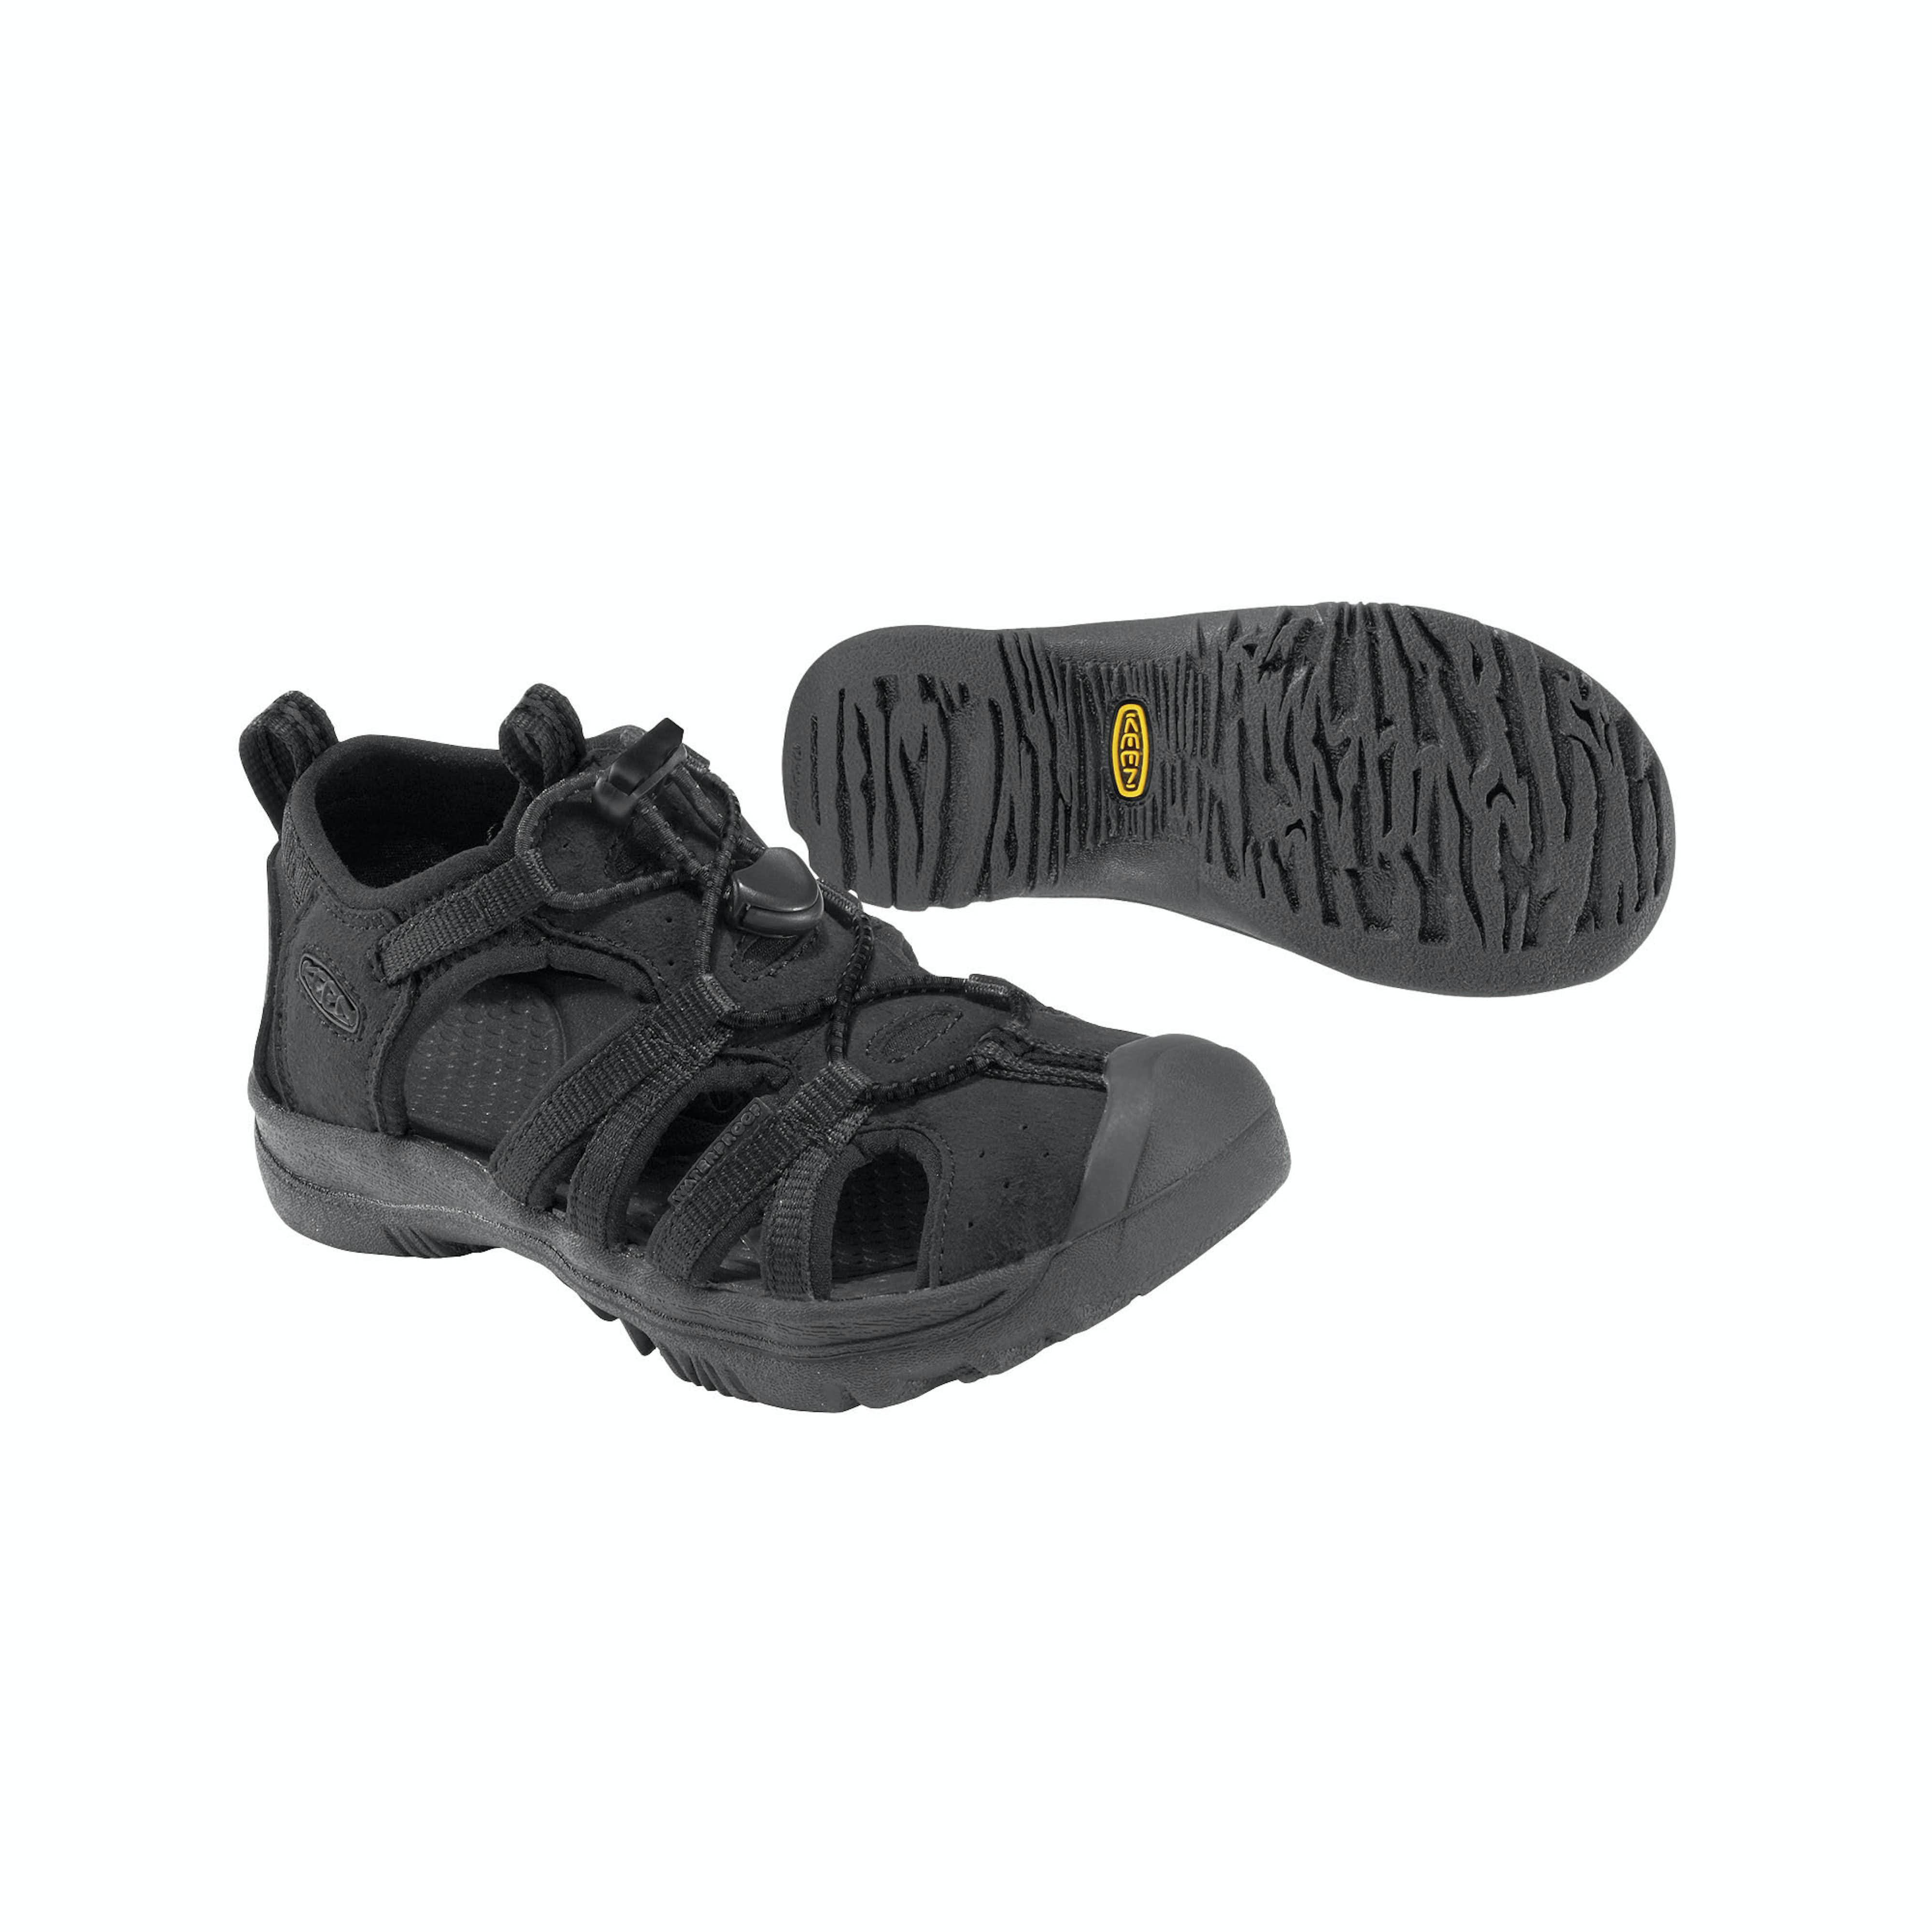 Keen Kanyon Kids  Sandals - Black Black